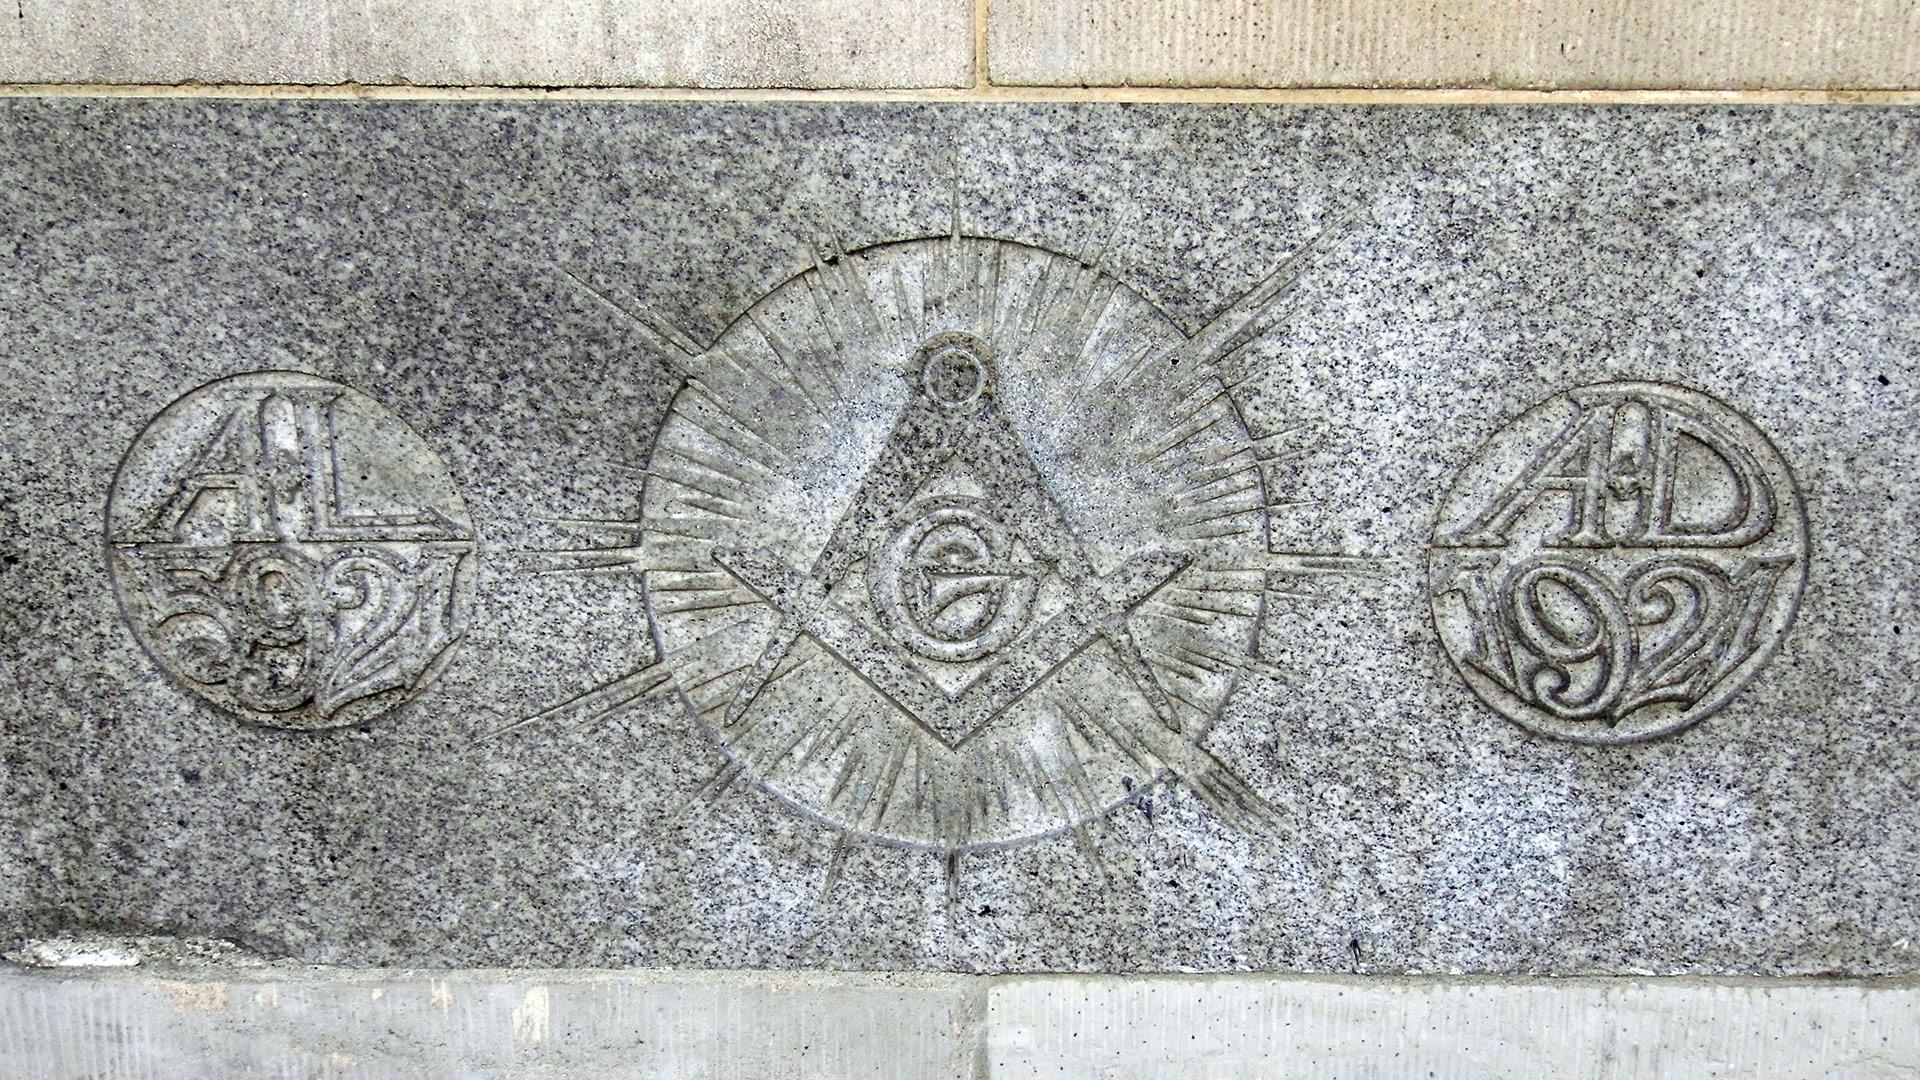 Masonic symbolism on the exterior of the Hollywood Masonic Temple. | Sandi Hemmerlein